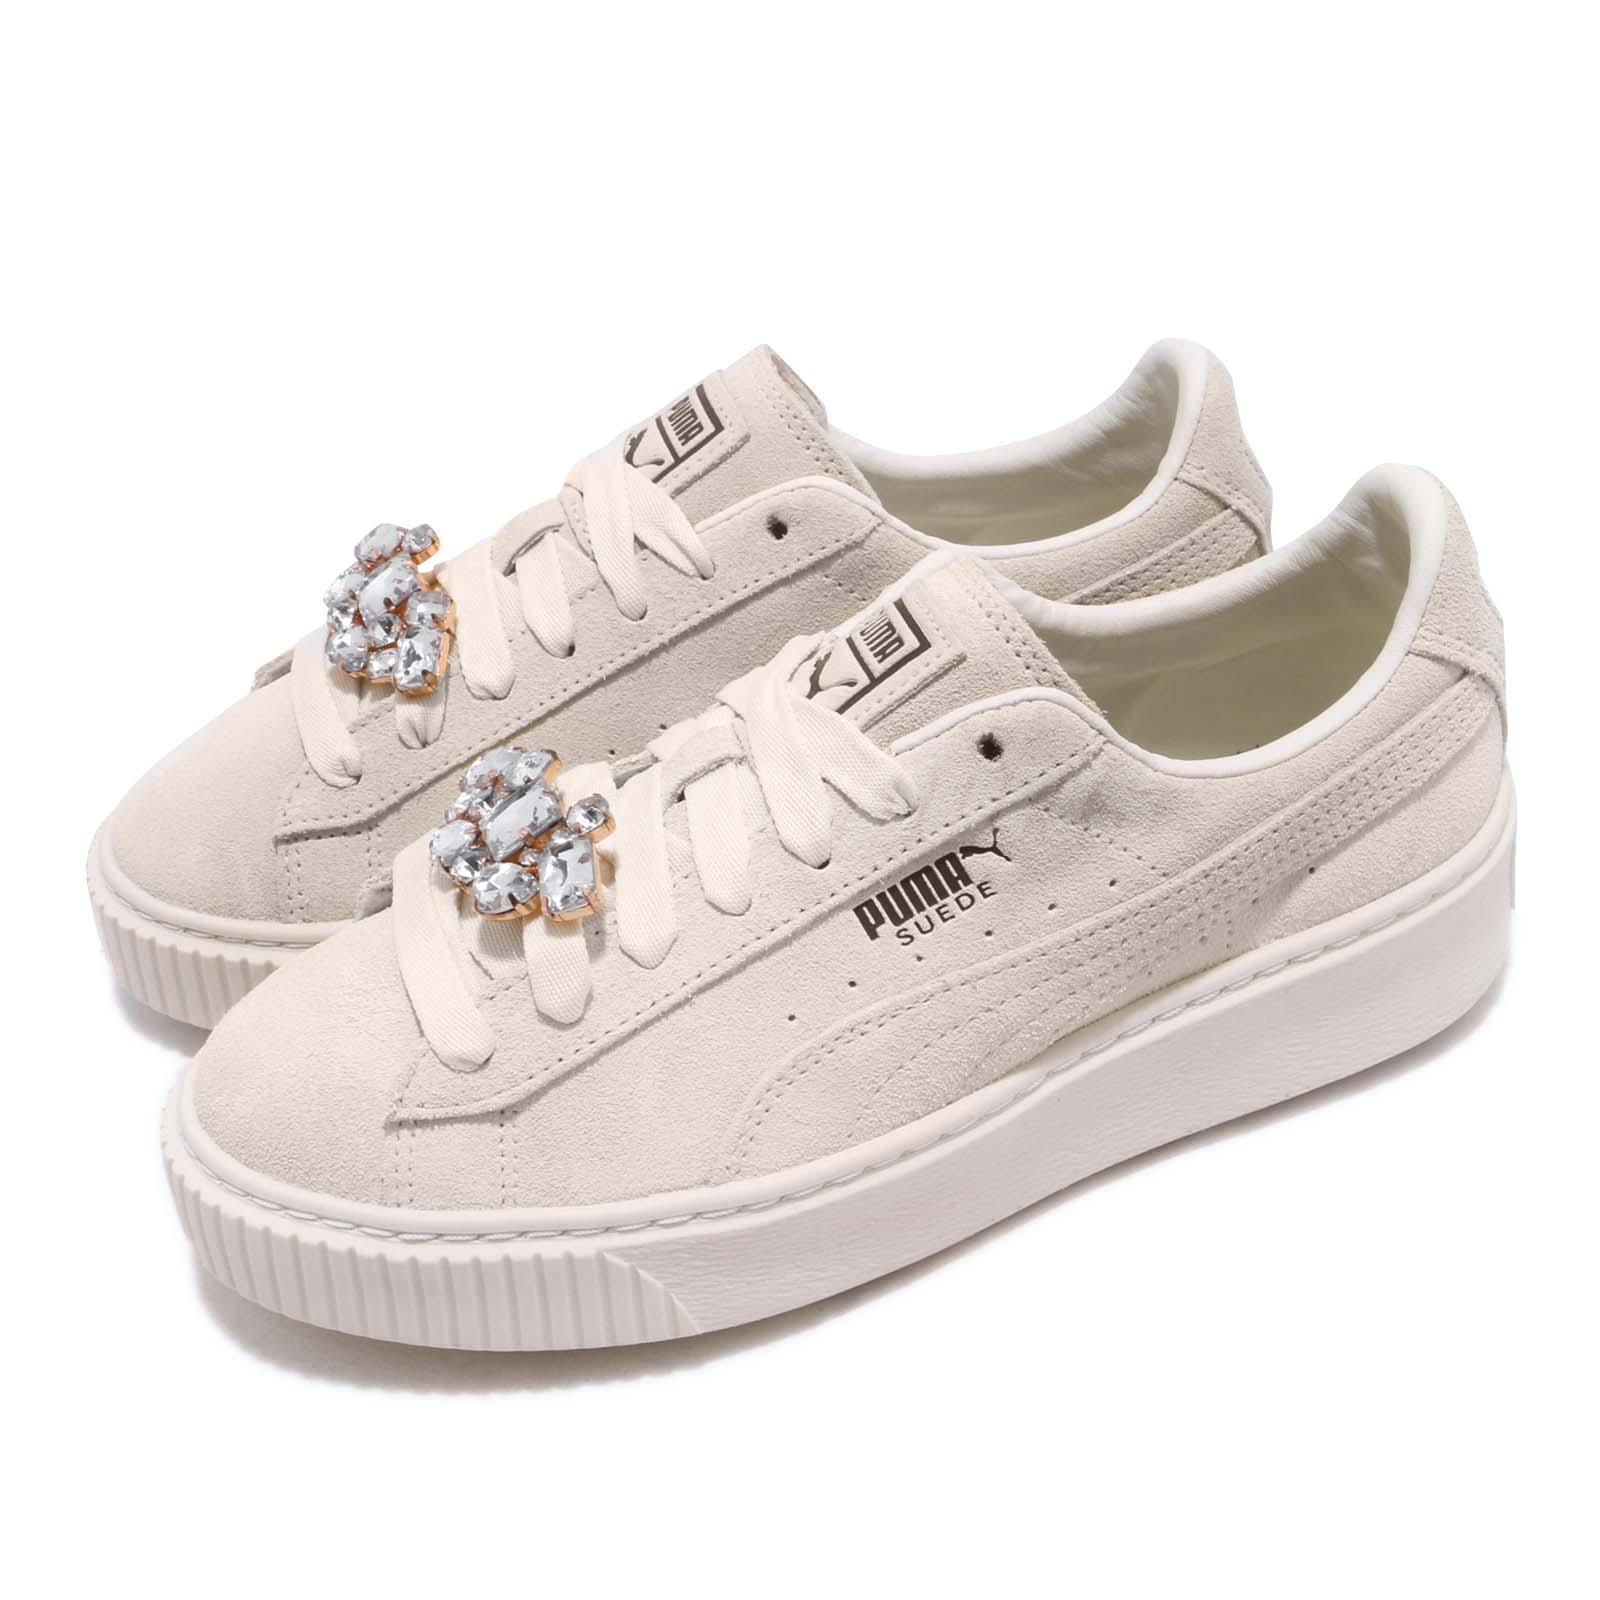 Details about Puma Suede Platform Gem Wns Ivory Womens Lifestyle Casual Shoes 367452-03